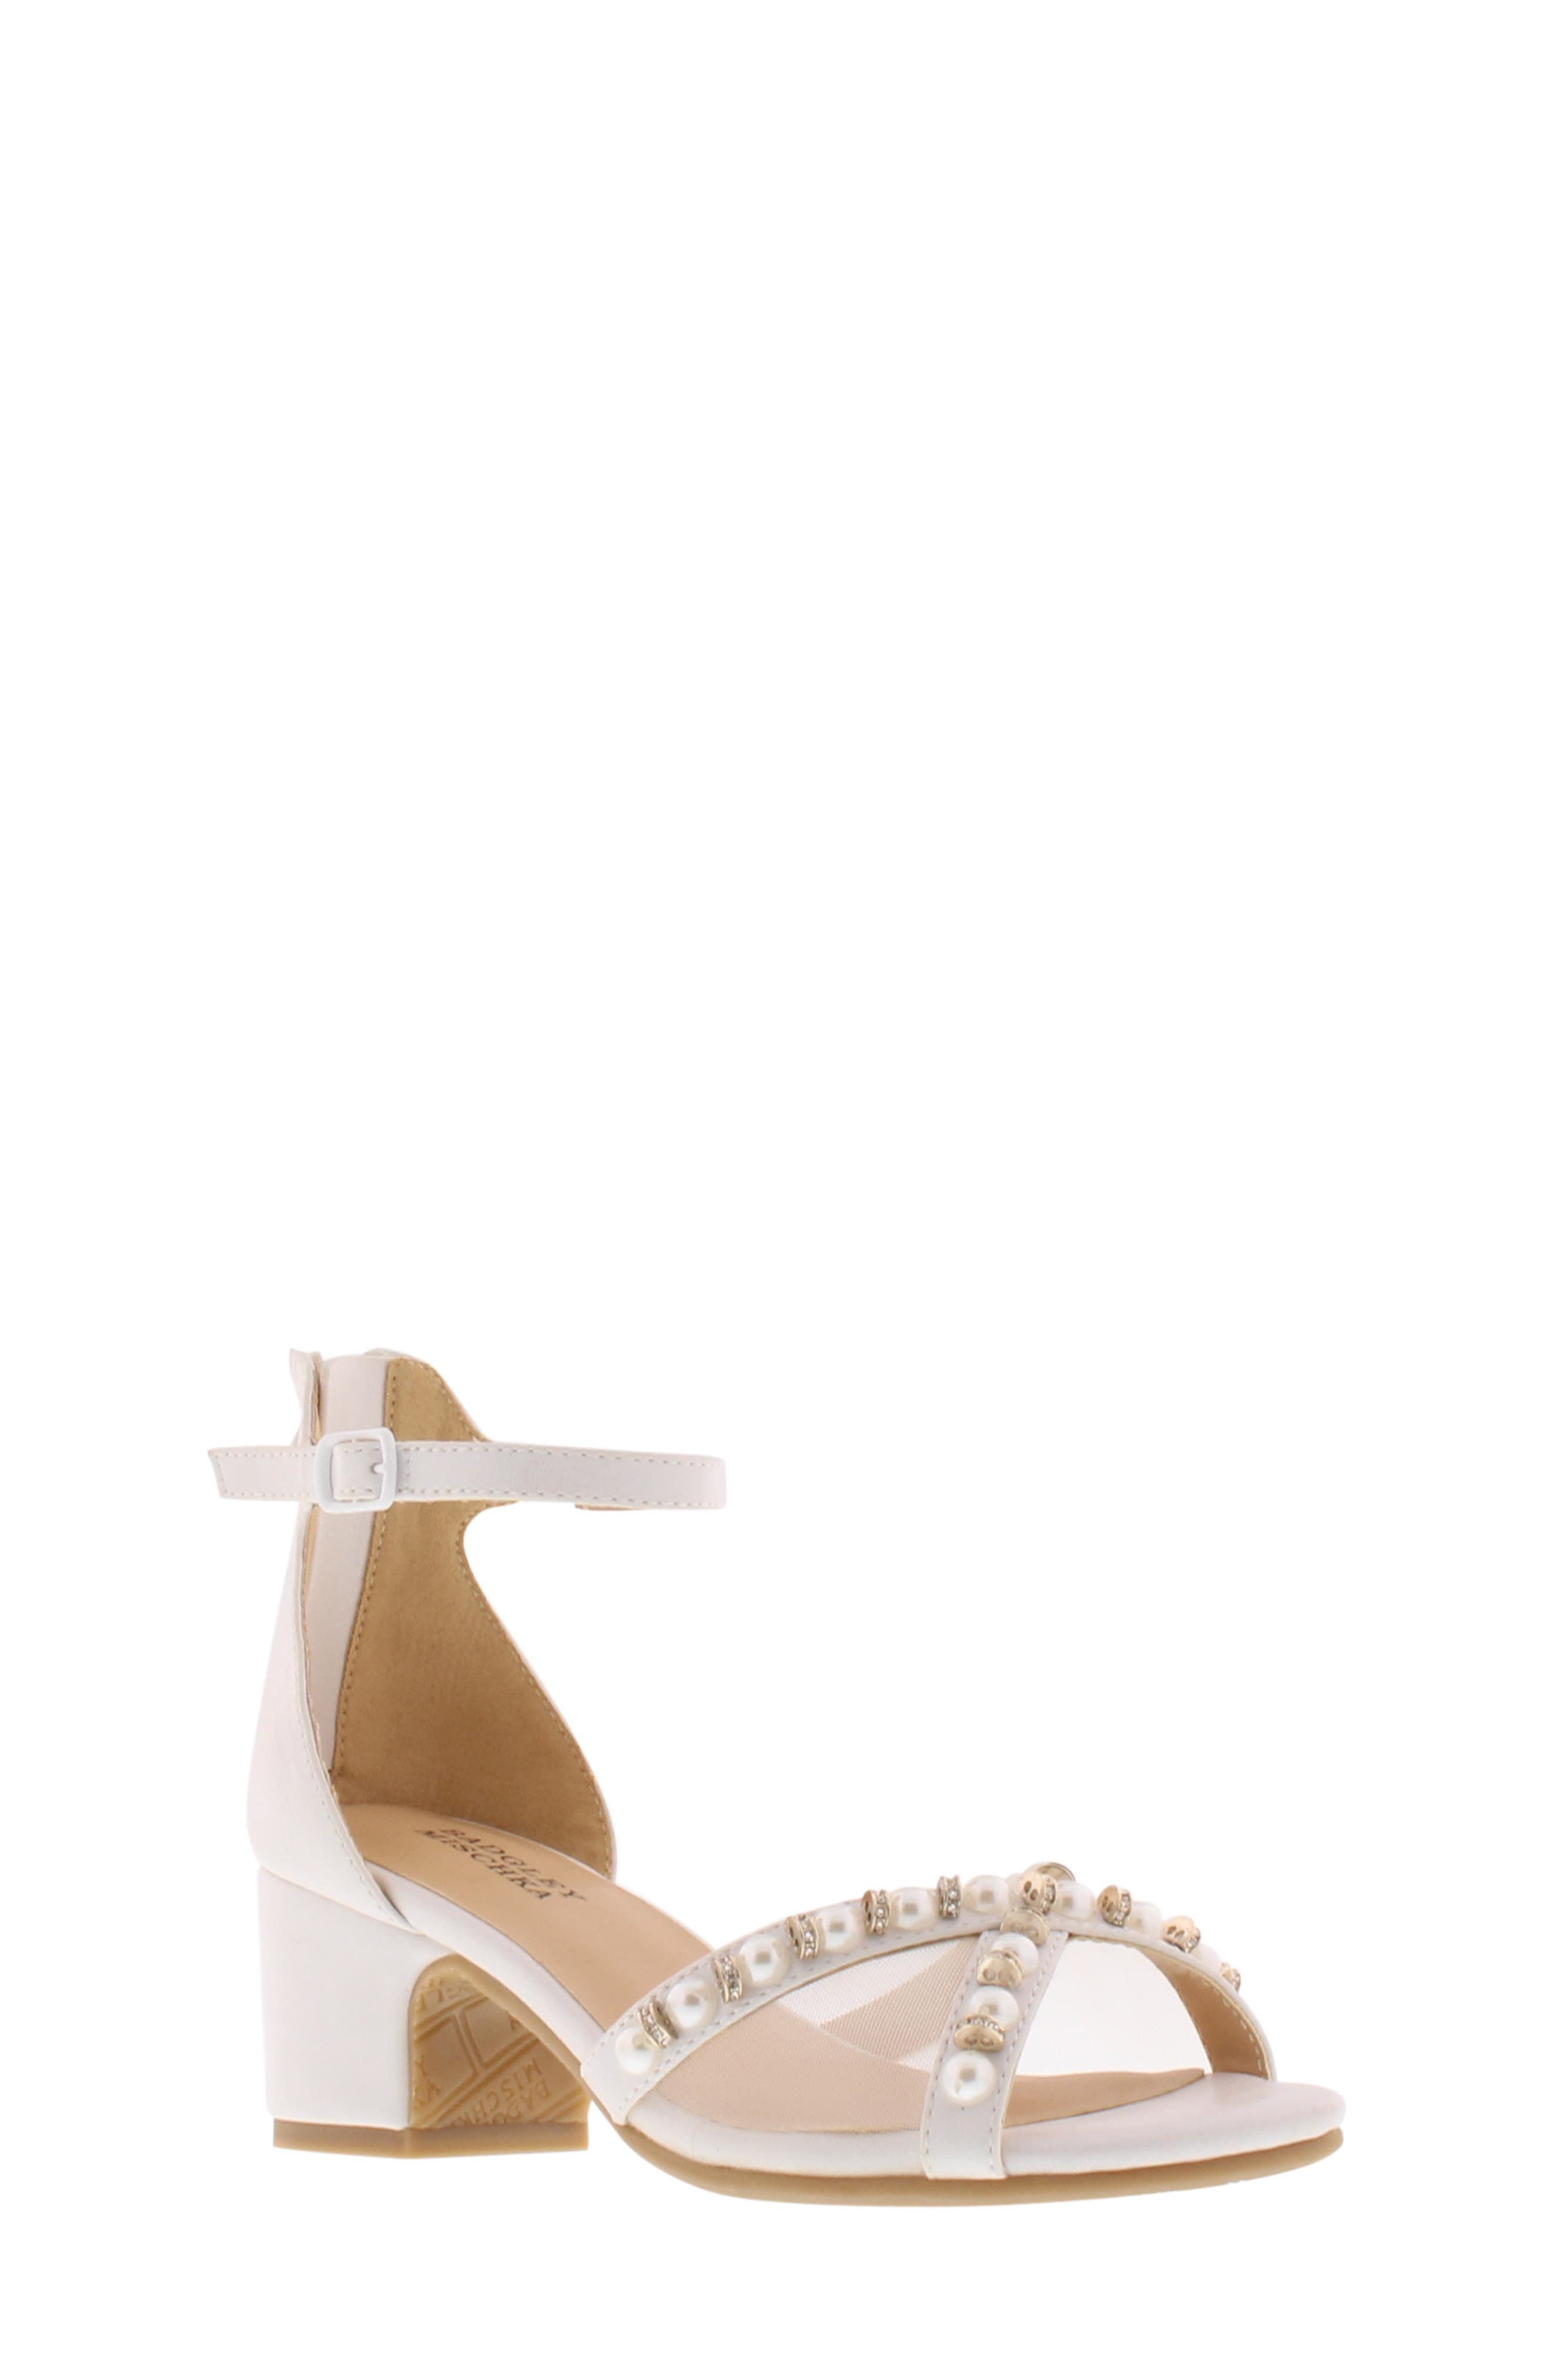 BADGLEY MISCHKA COLLECTION, Badgley Mischka Pernia Emily Embellished Sandal, Main thumbnail 1, color, WHITE SHIMMER